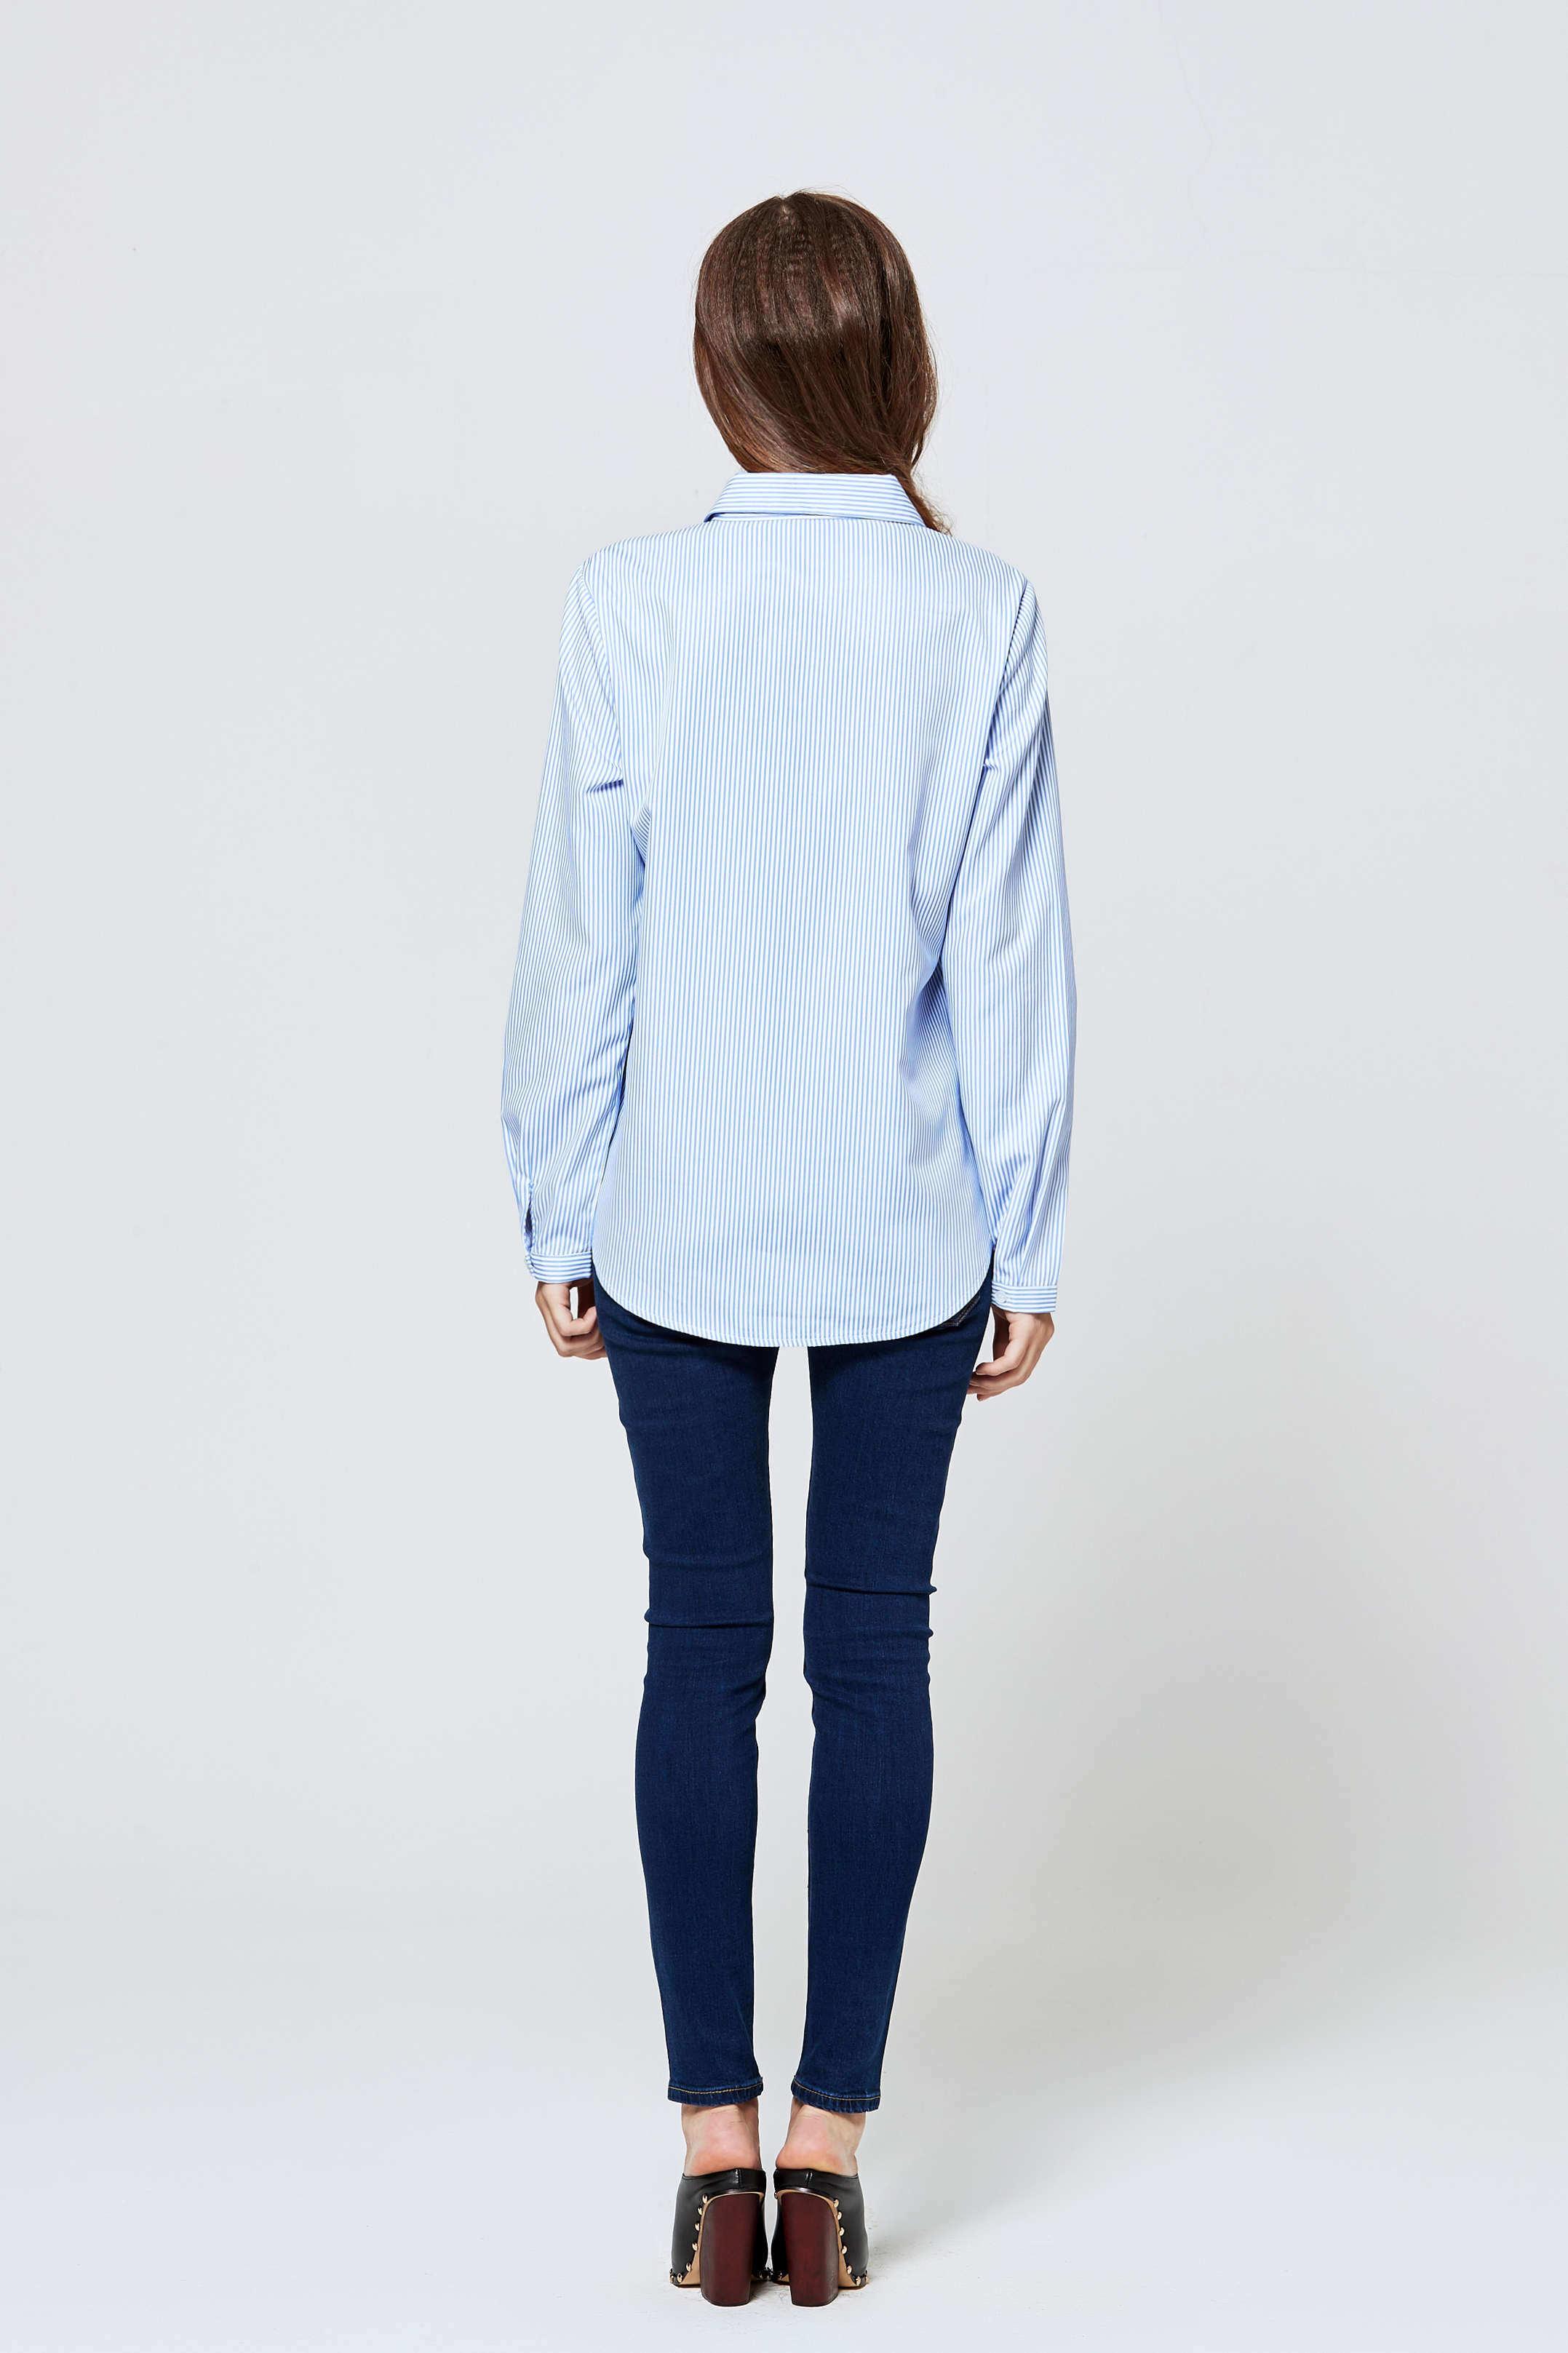 Cheap Bulk T Shirts China Rldm